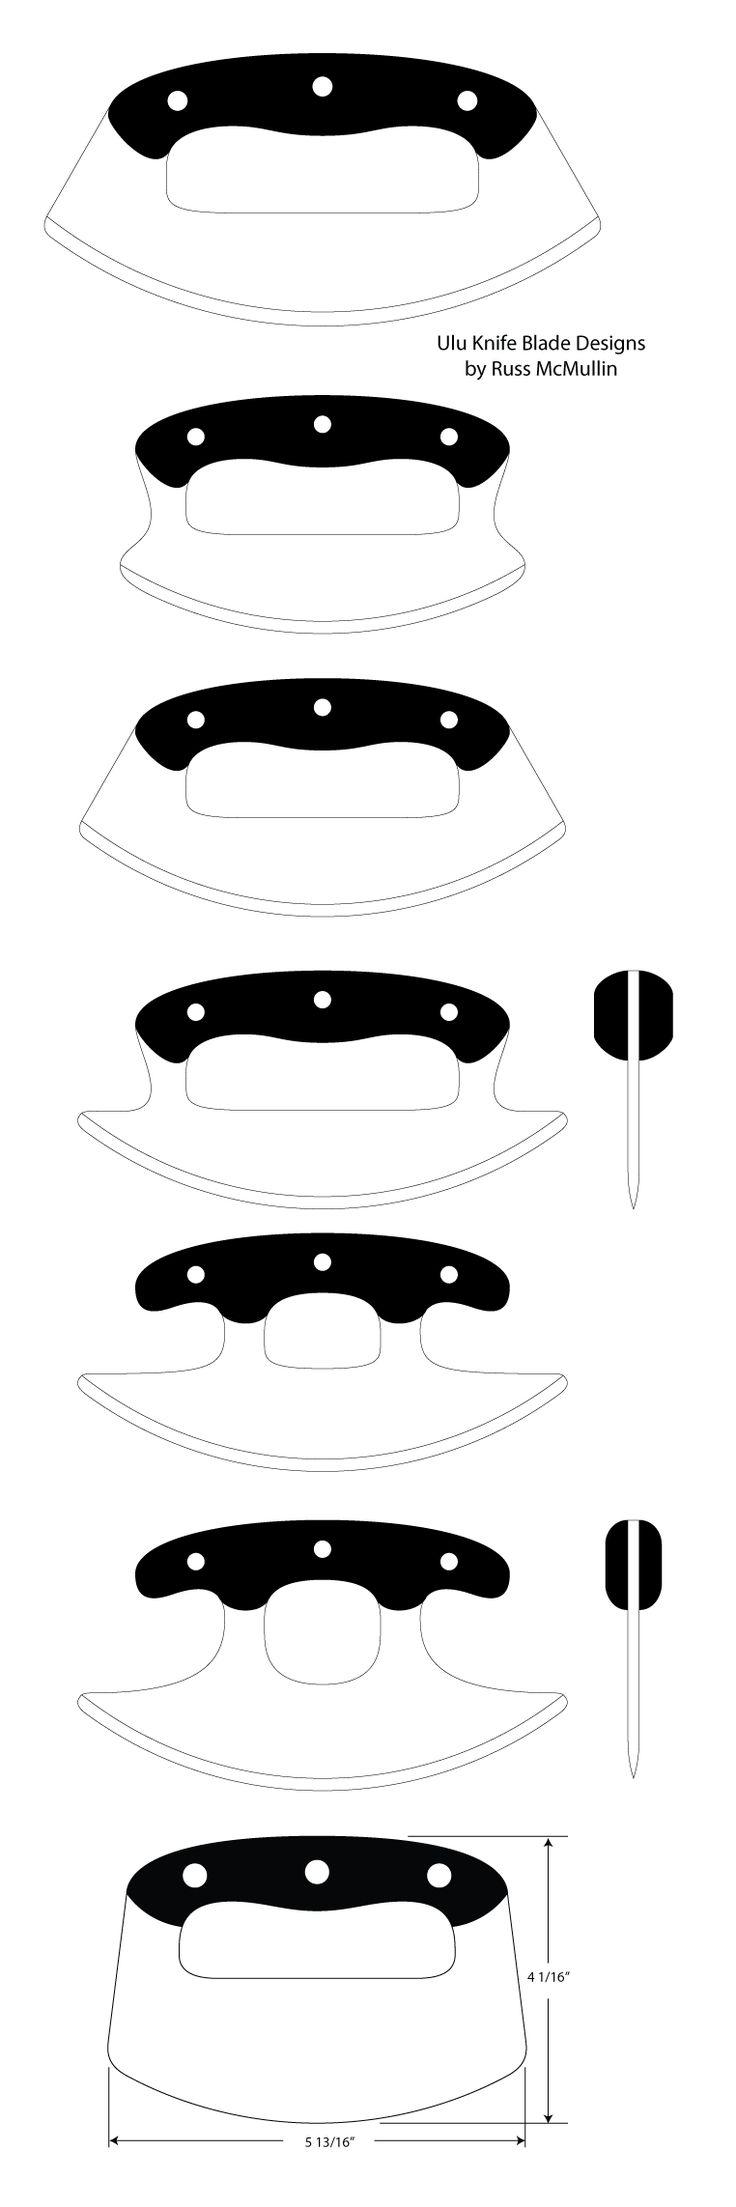 http://catjuggling.com/wp-content/uploads/2014/03/ulu-knife-blade-designs.png